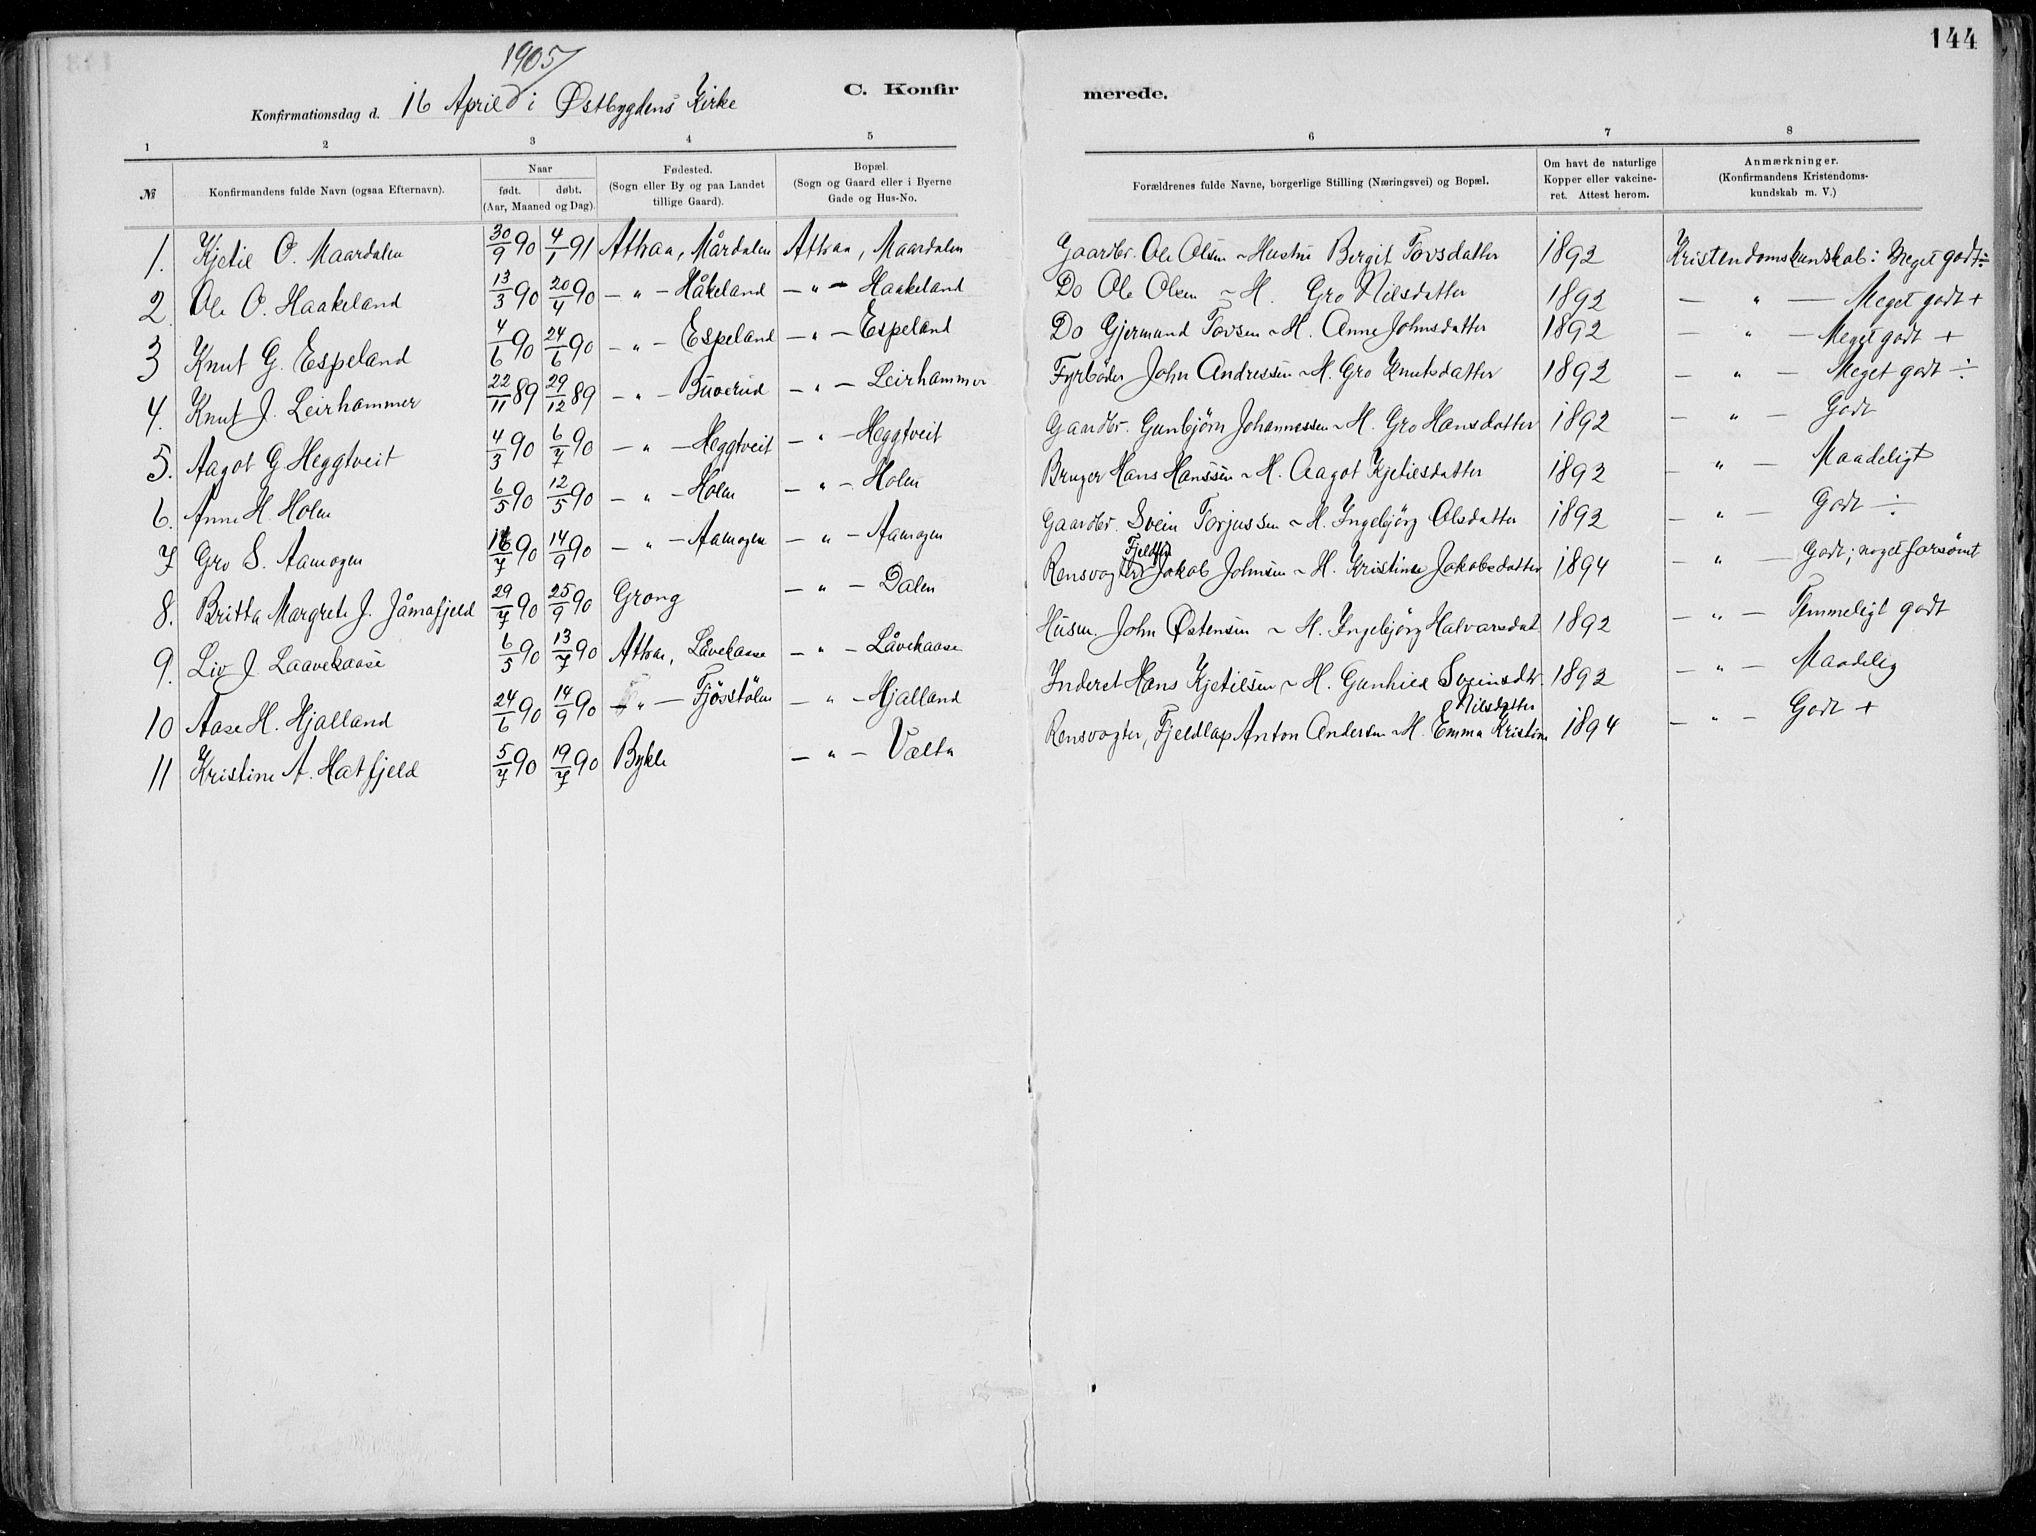 SAKO, Tinn kirkebøker, F/Fa/L0007: Ministerialbok nr. I 7, 1878-1922, s. 144